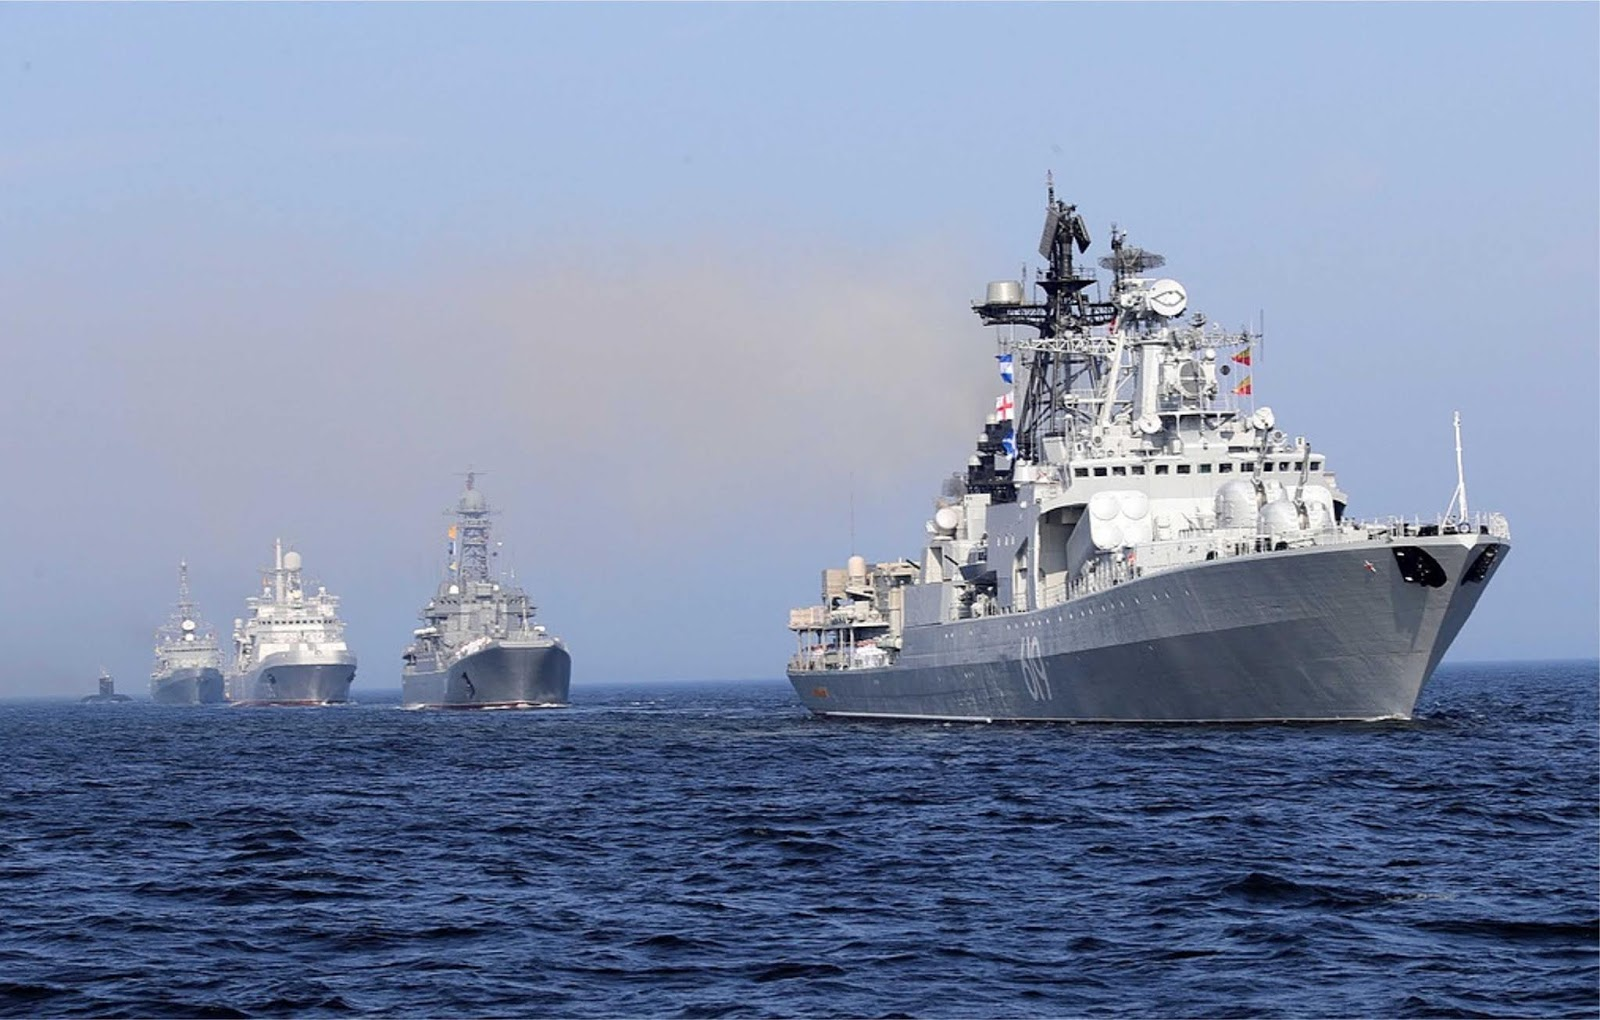 Armada Laut Hitam akan ditambahkan empat kapal baru pada akhir 2018 dan awal 2019